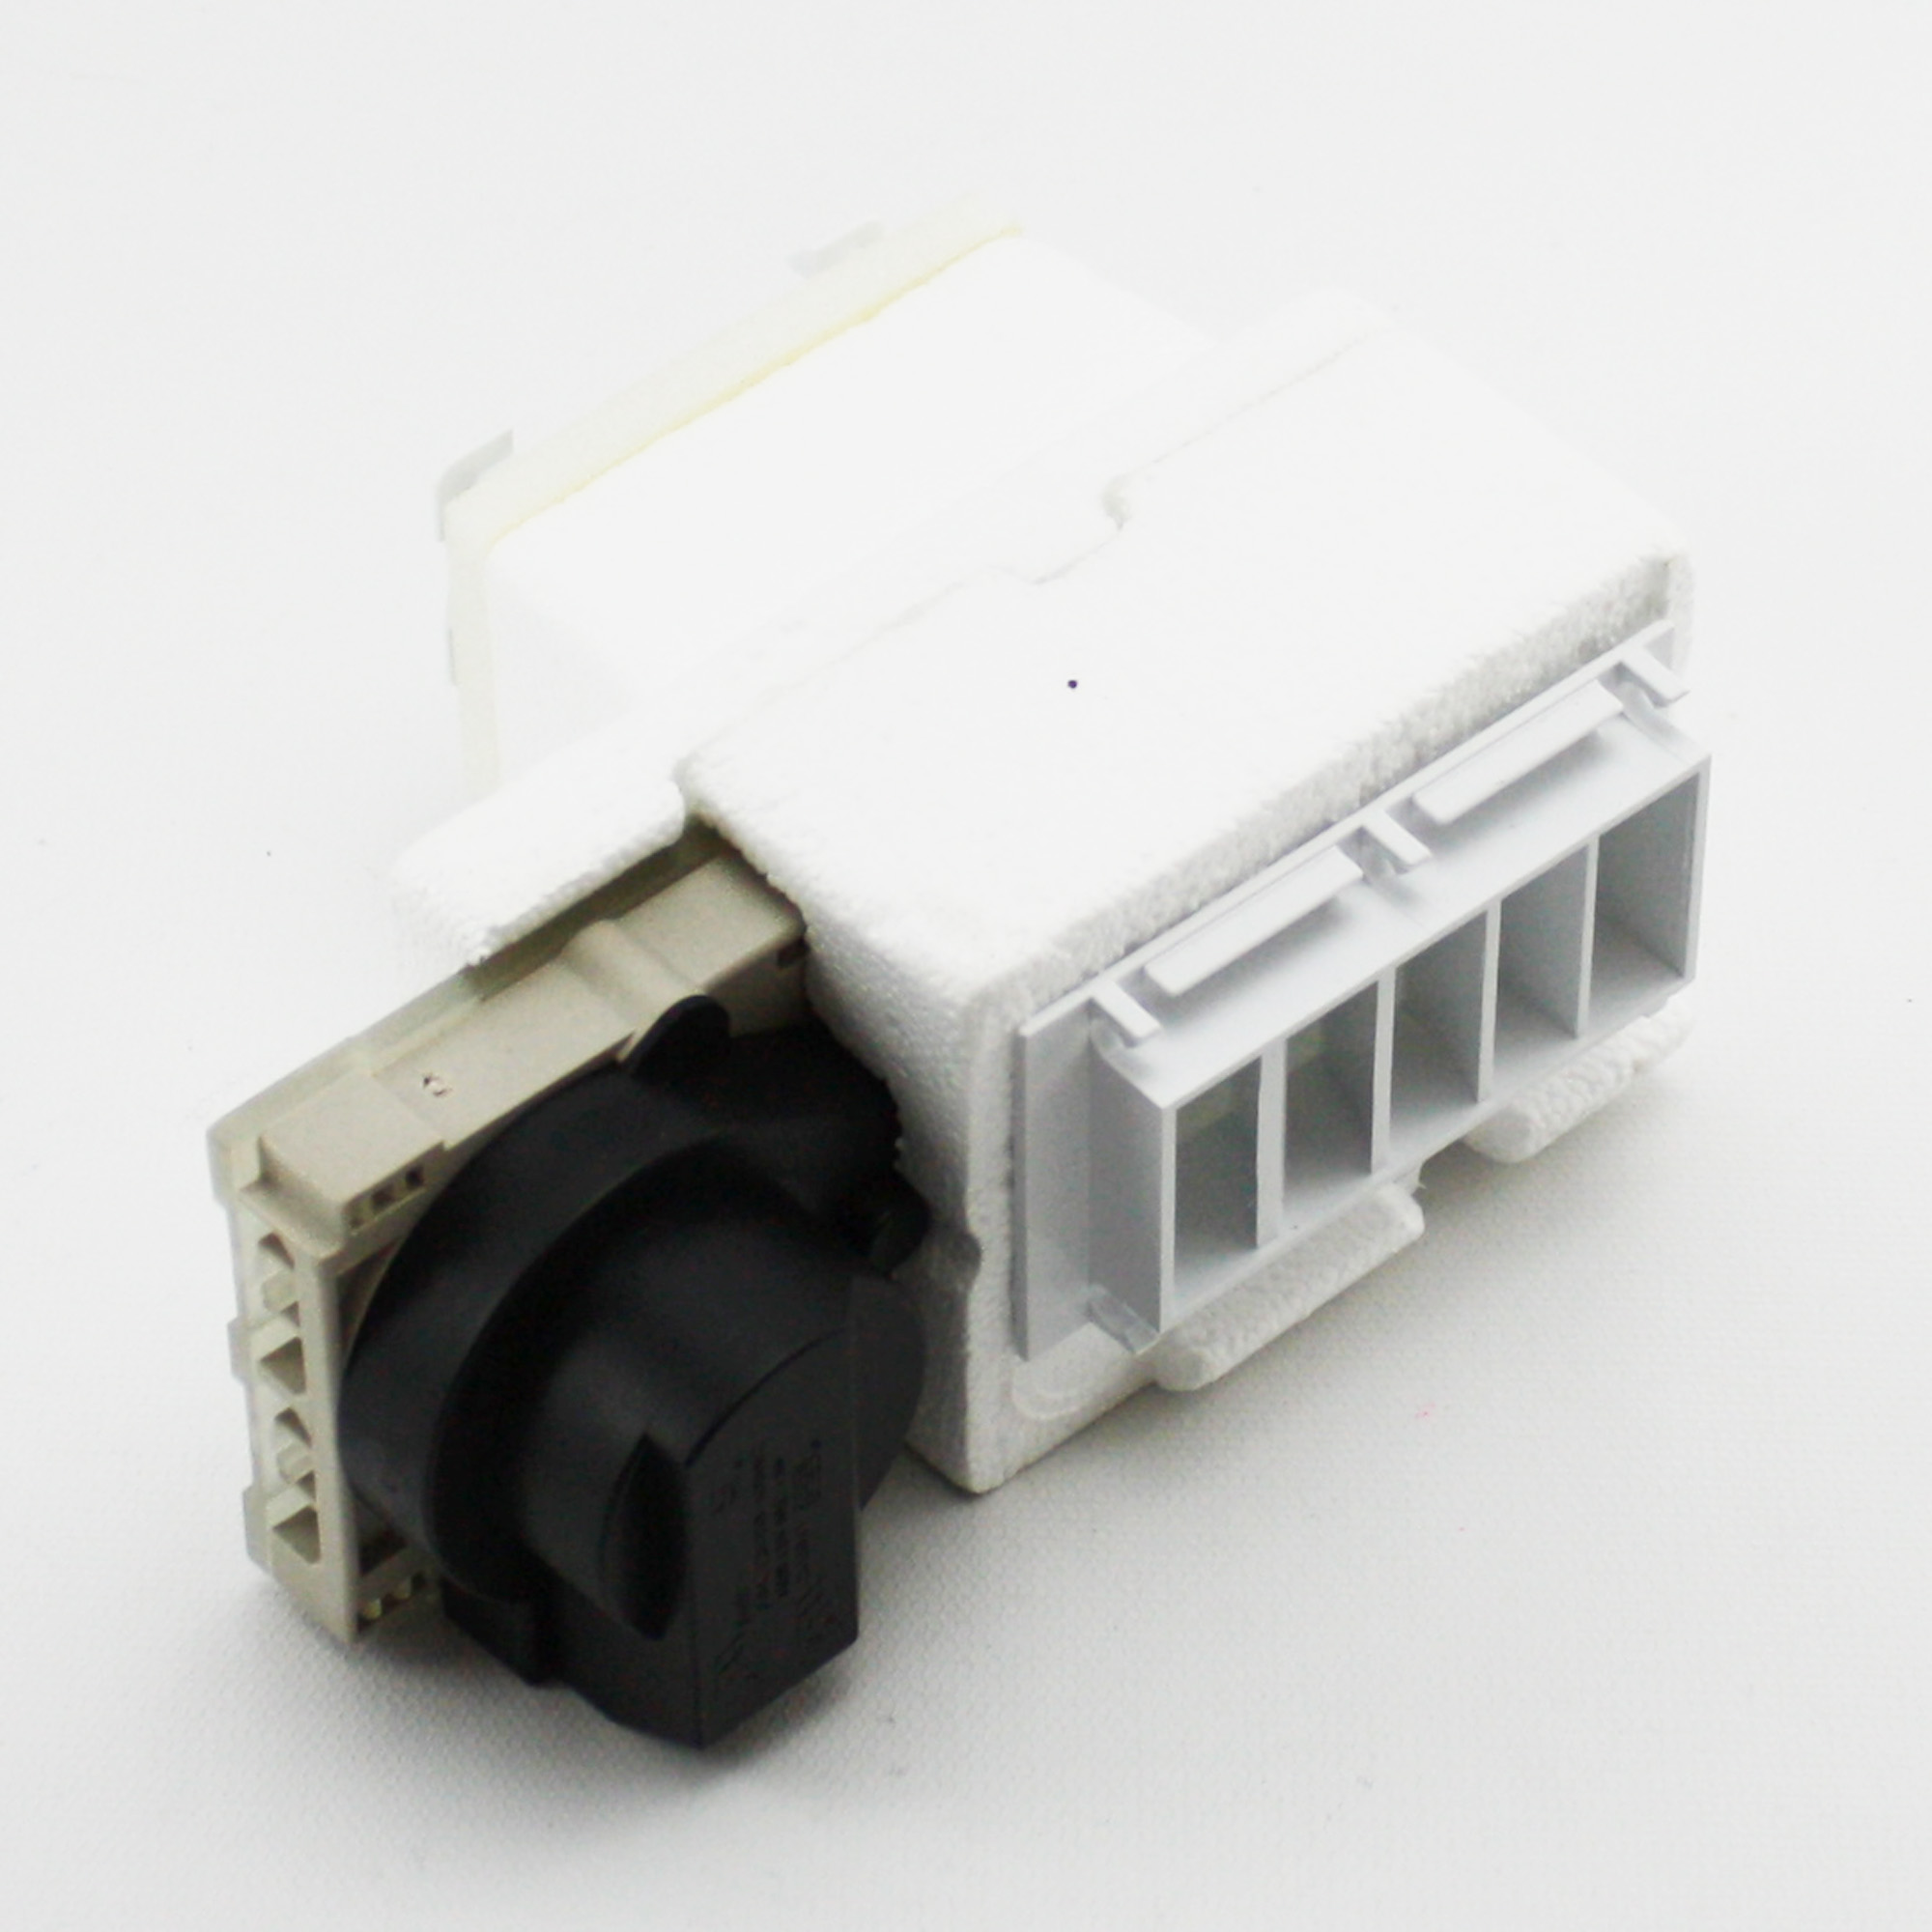 Genuine Oem 2216112 Whirlpool Refrigerator Air Diffuser